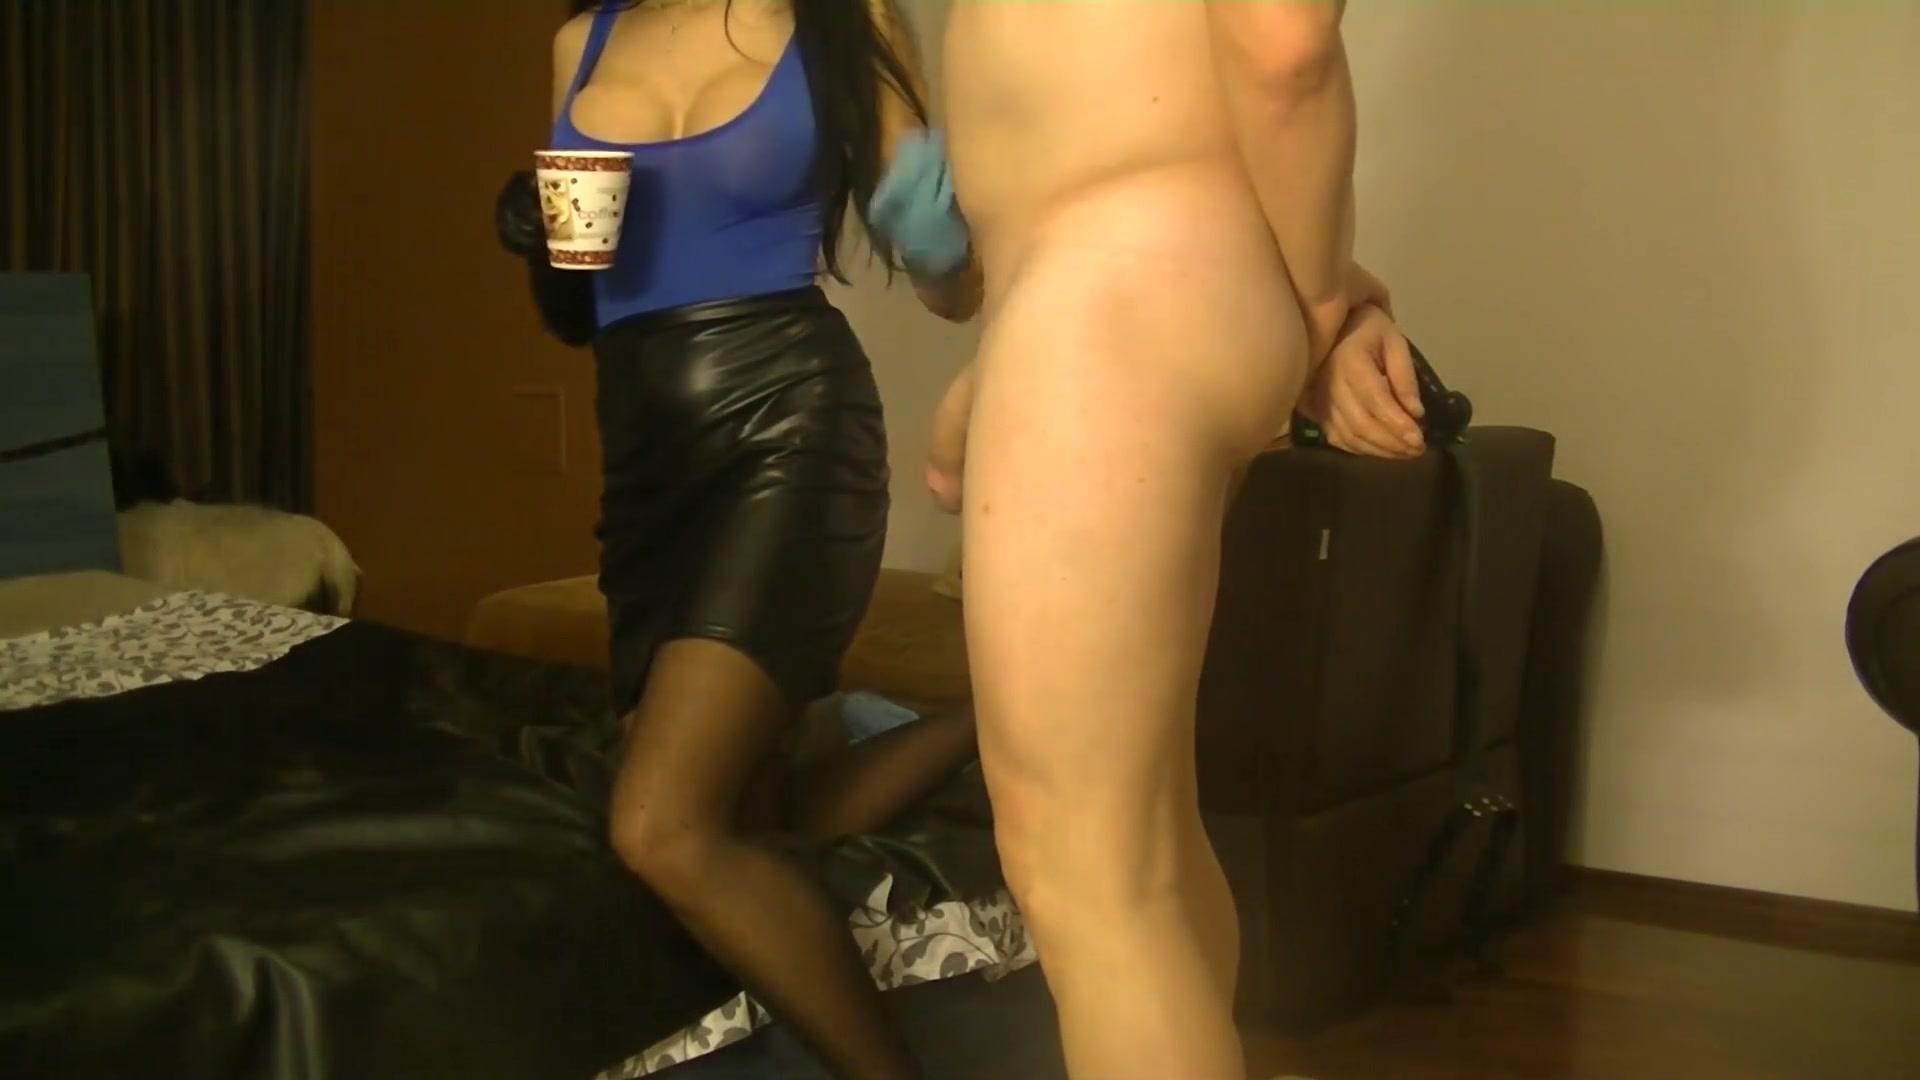 MISTRESS ANTONELLA - BDSM and FETISH Sexy catsuit pics